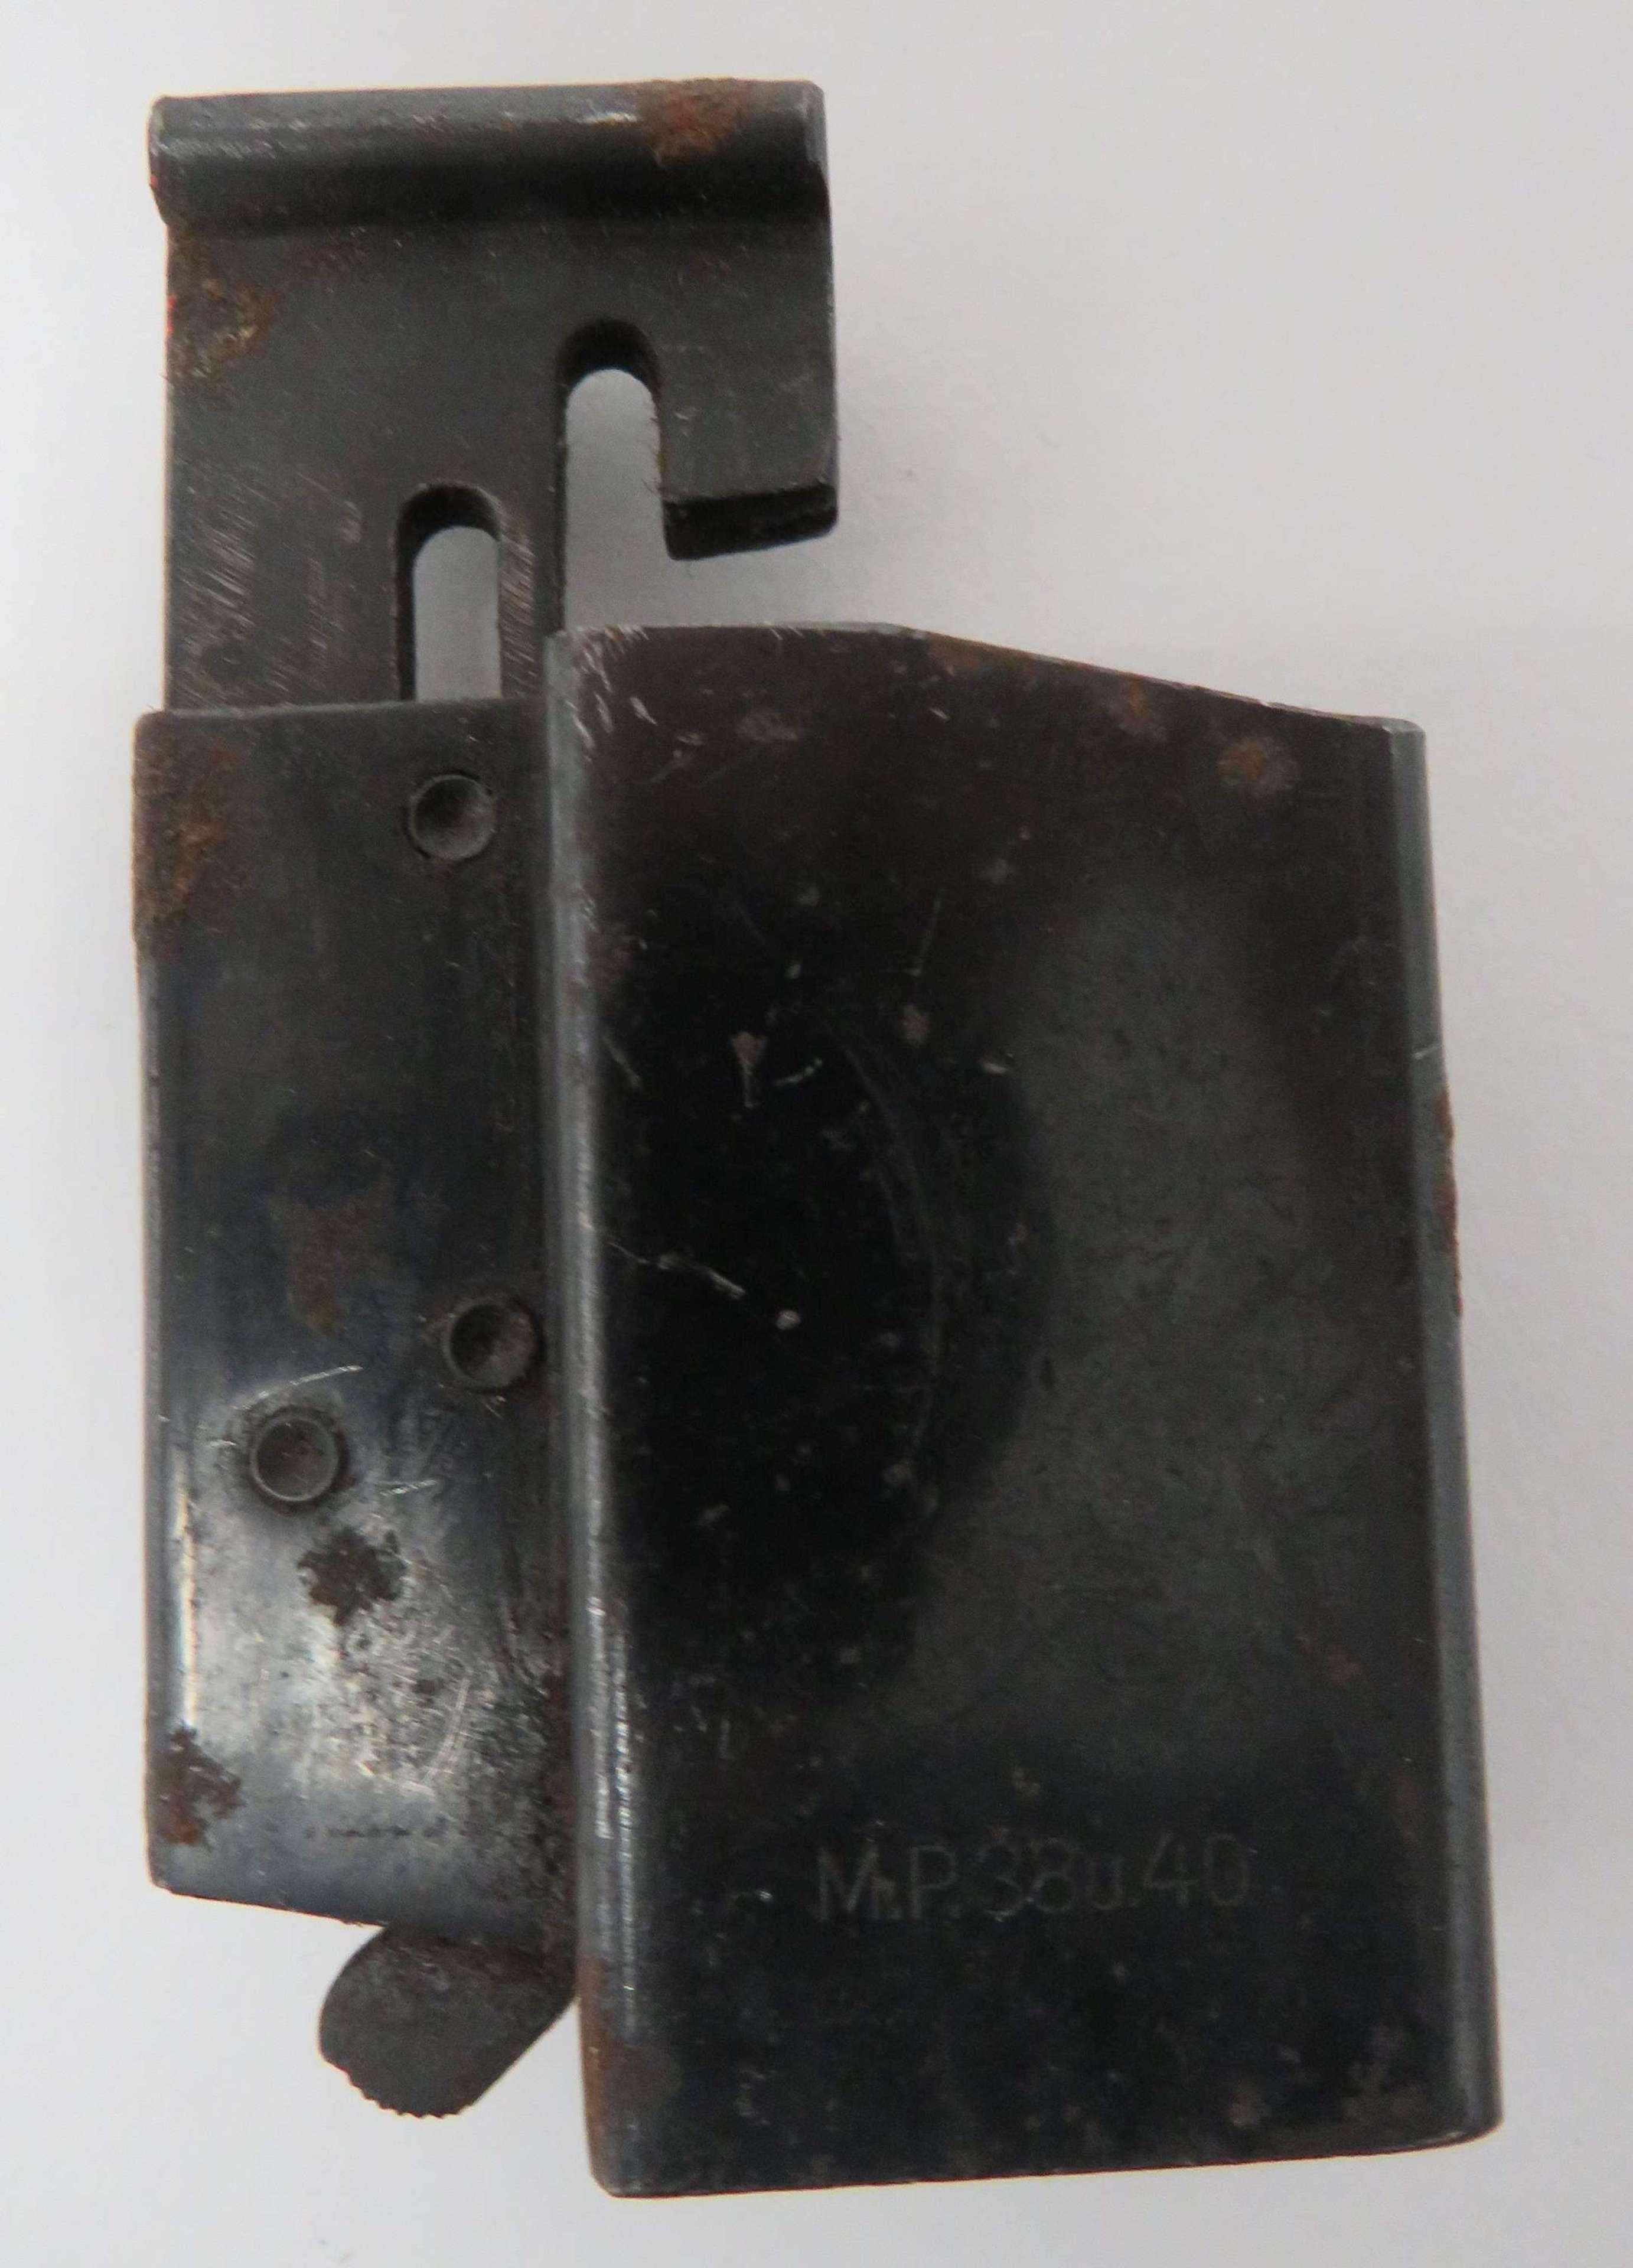 WW2 German MP38/40 Magazine Loading Tool